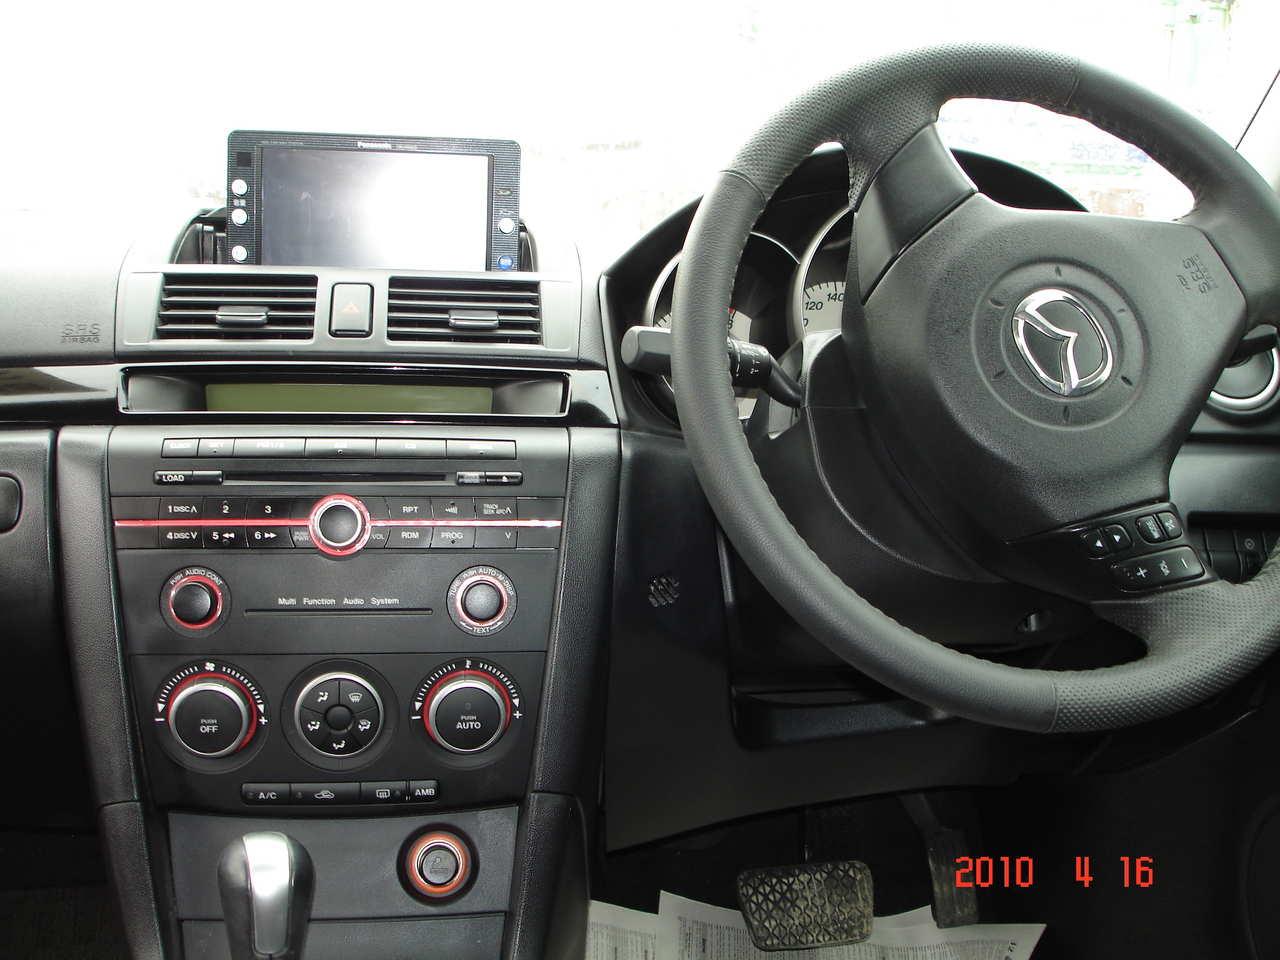 Mazdaspeed3 For Sale >> 2008 Mazda Axela For Sale, 1500cc., Gasoline, FF, Automatic For Sale